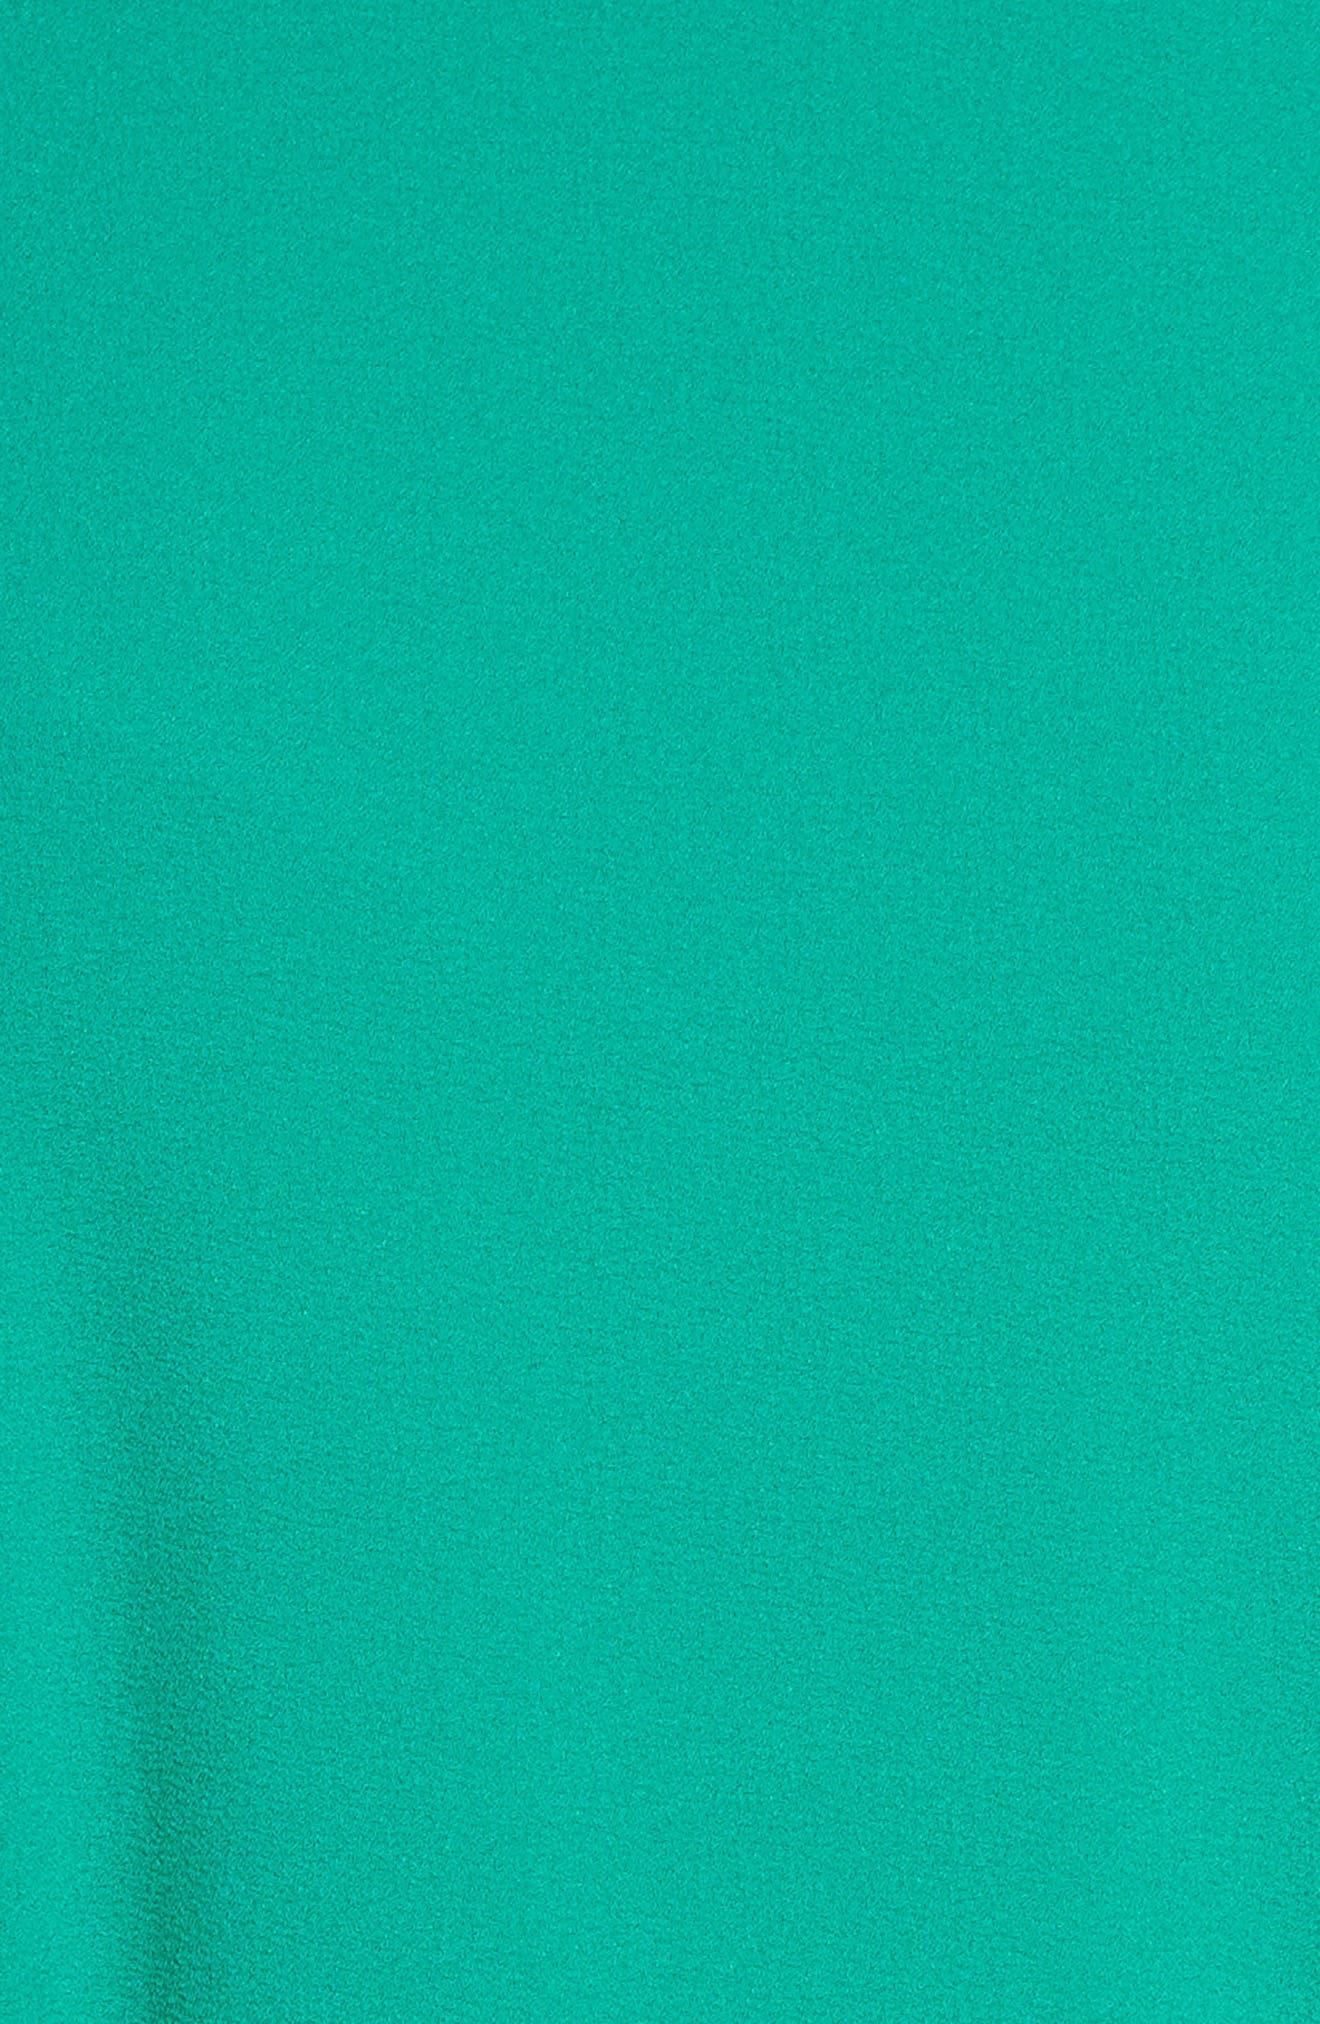 Dara Shift Dress,                             Alternate thumbnail 6, color,                             319